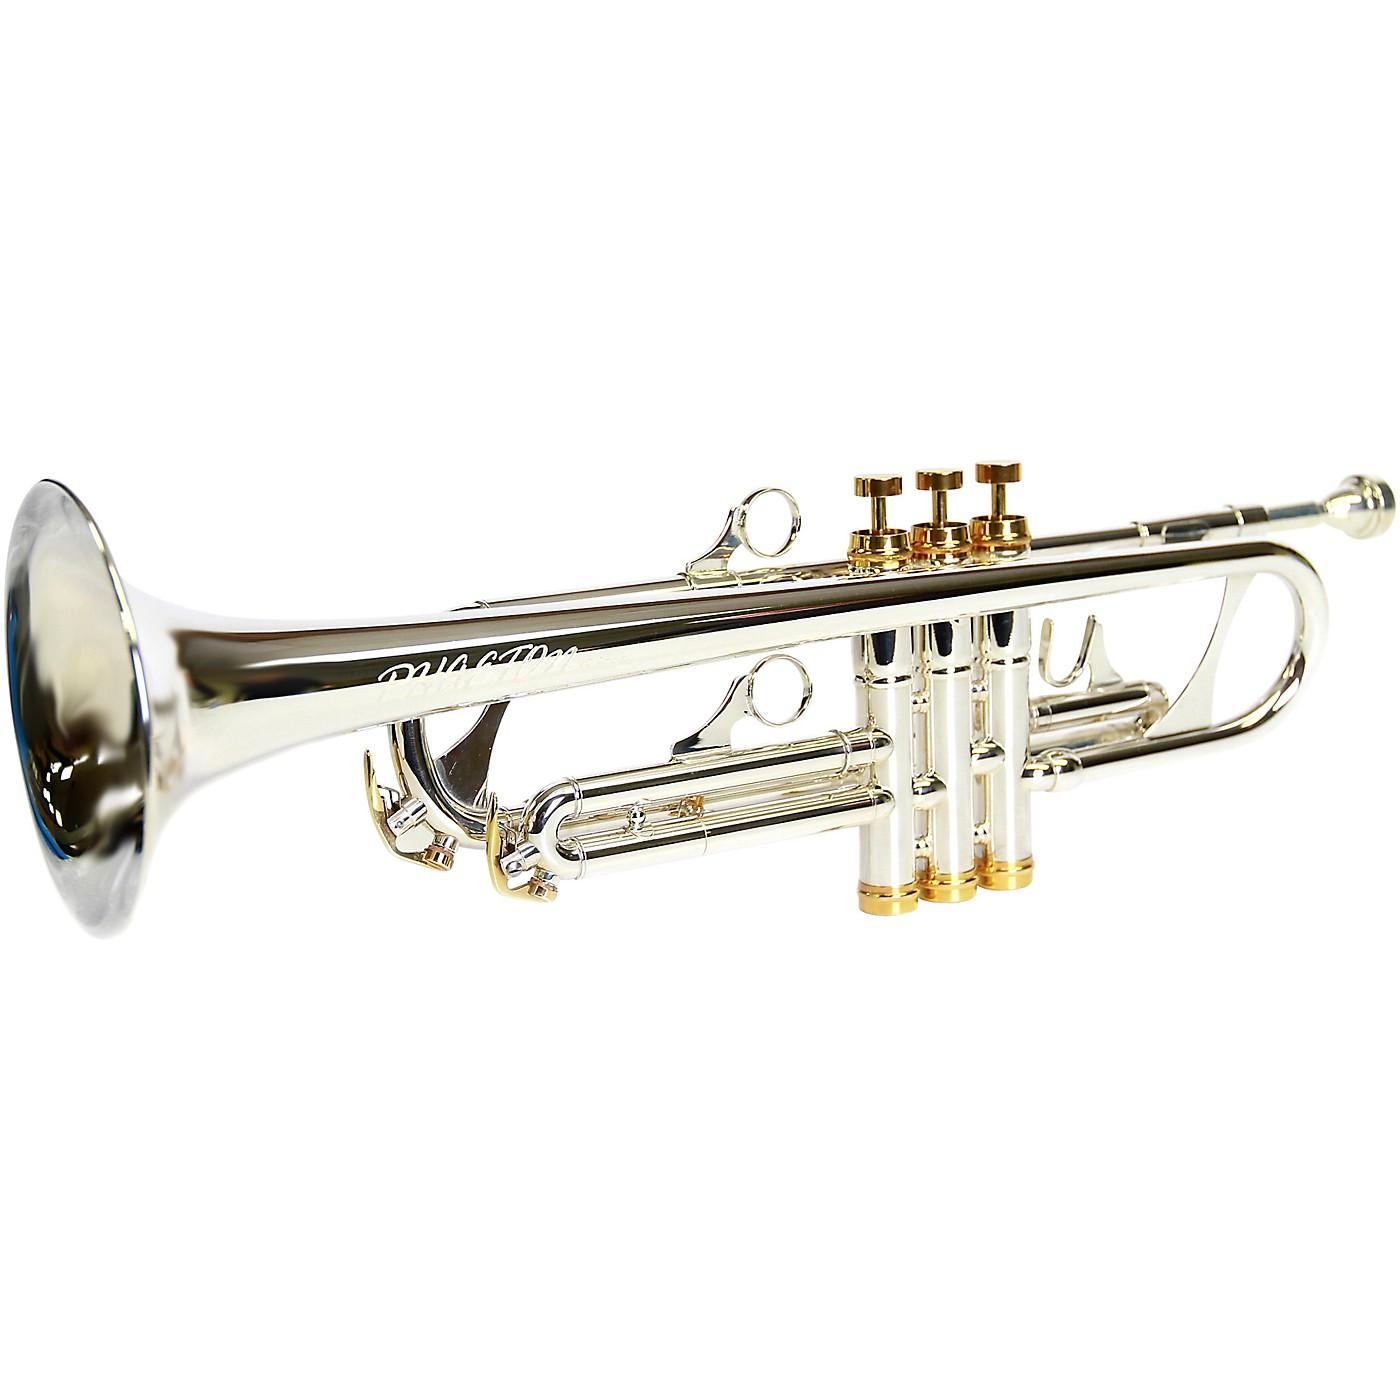 Phaeton PHT-2050 Custom Series Bb Trumpet thumbnail